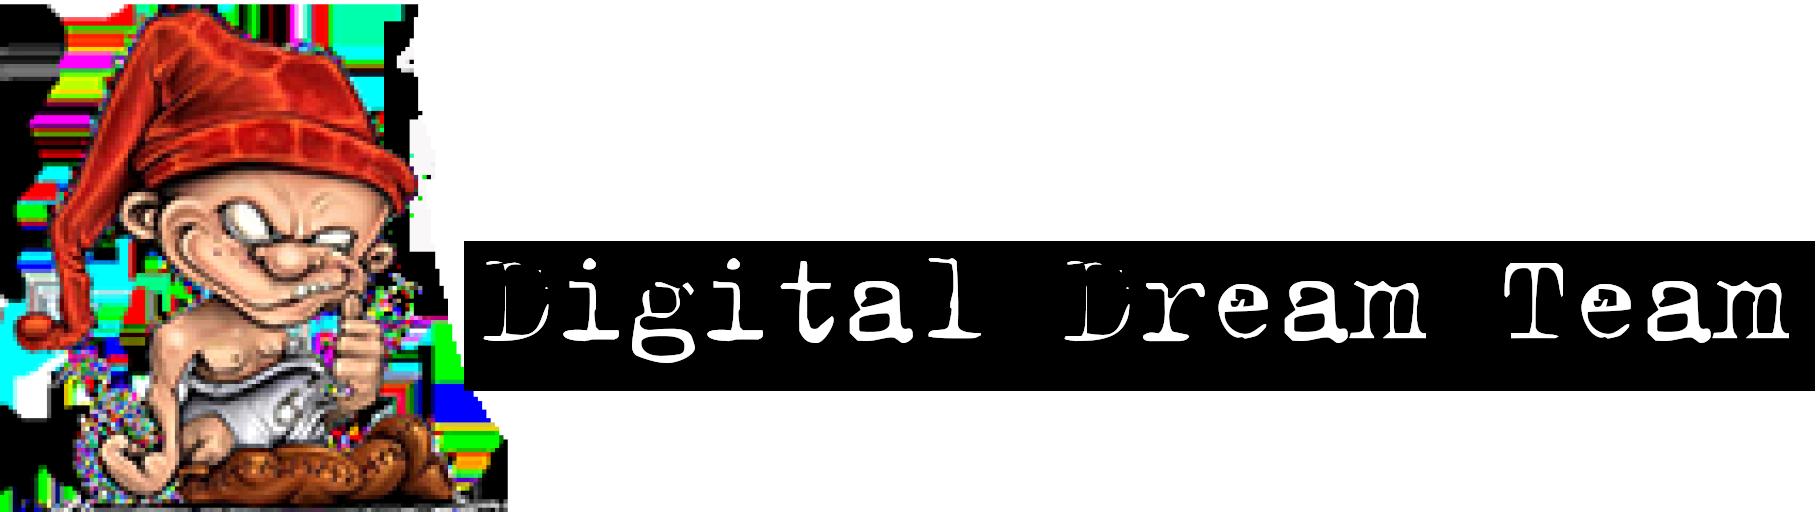 Digital Dream Team